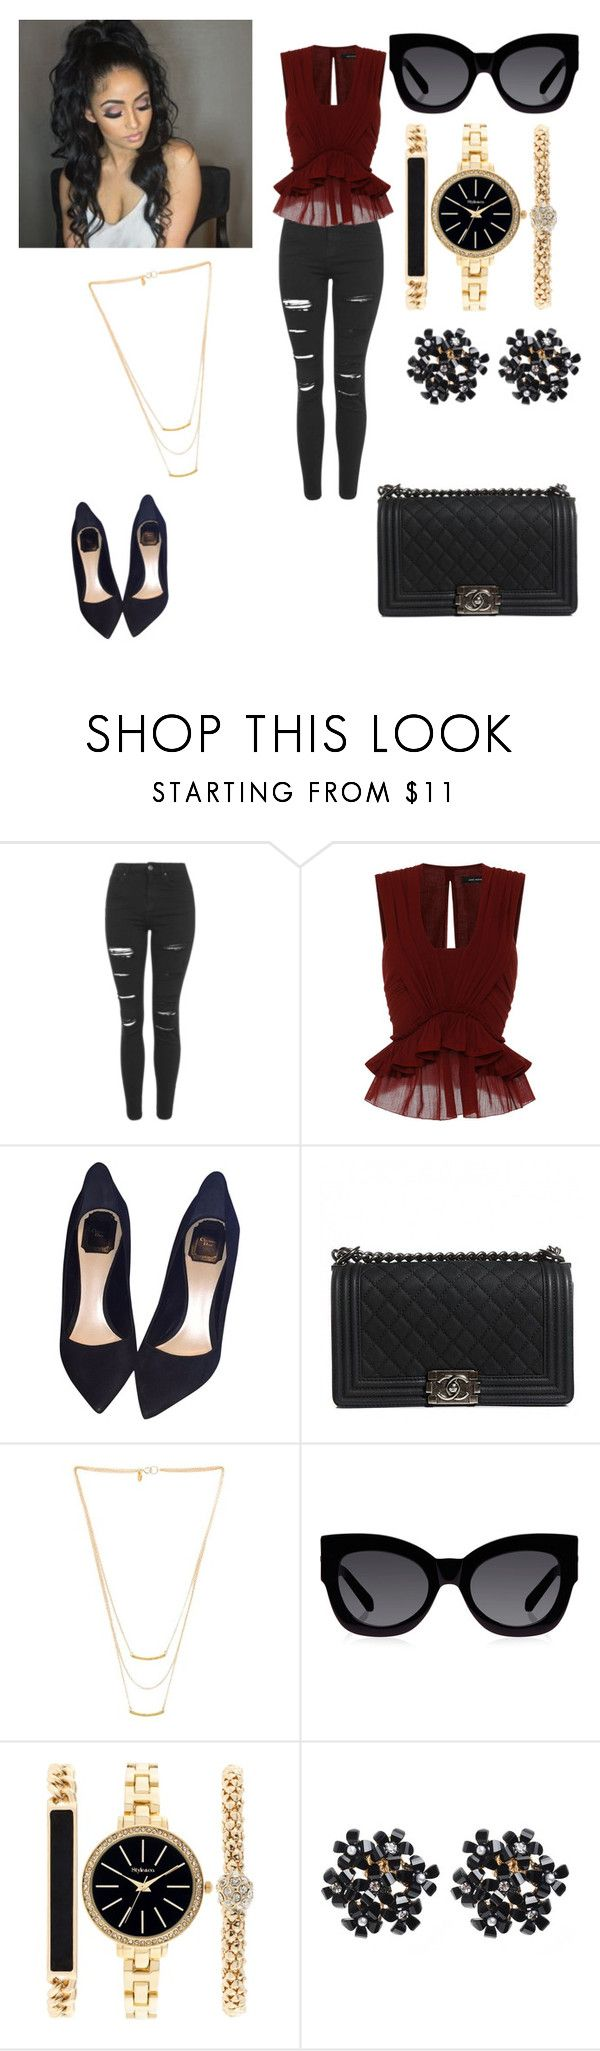 Un toque para resaltar by olgasanchez09 on Polyvore featuring moda, Isabel Marant, Topshop, Christian Dior, Chanel, Style & Co., Gorjana and Karen Walker